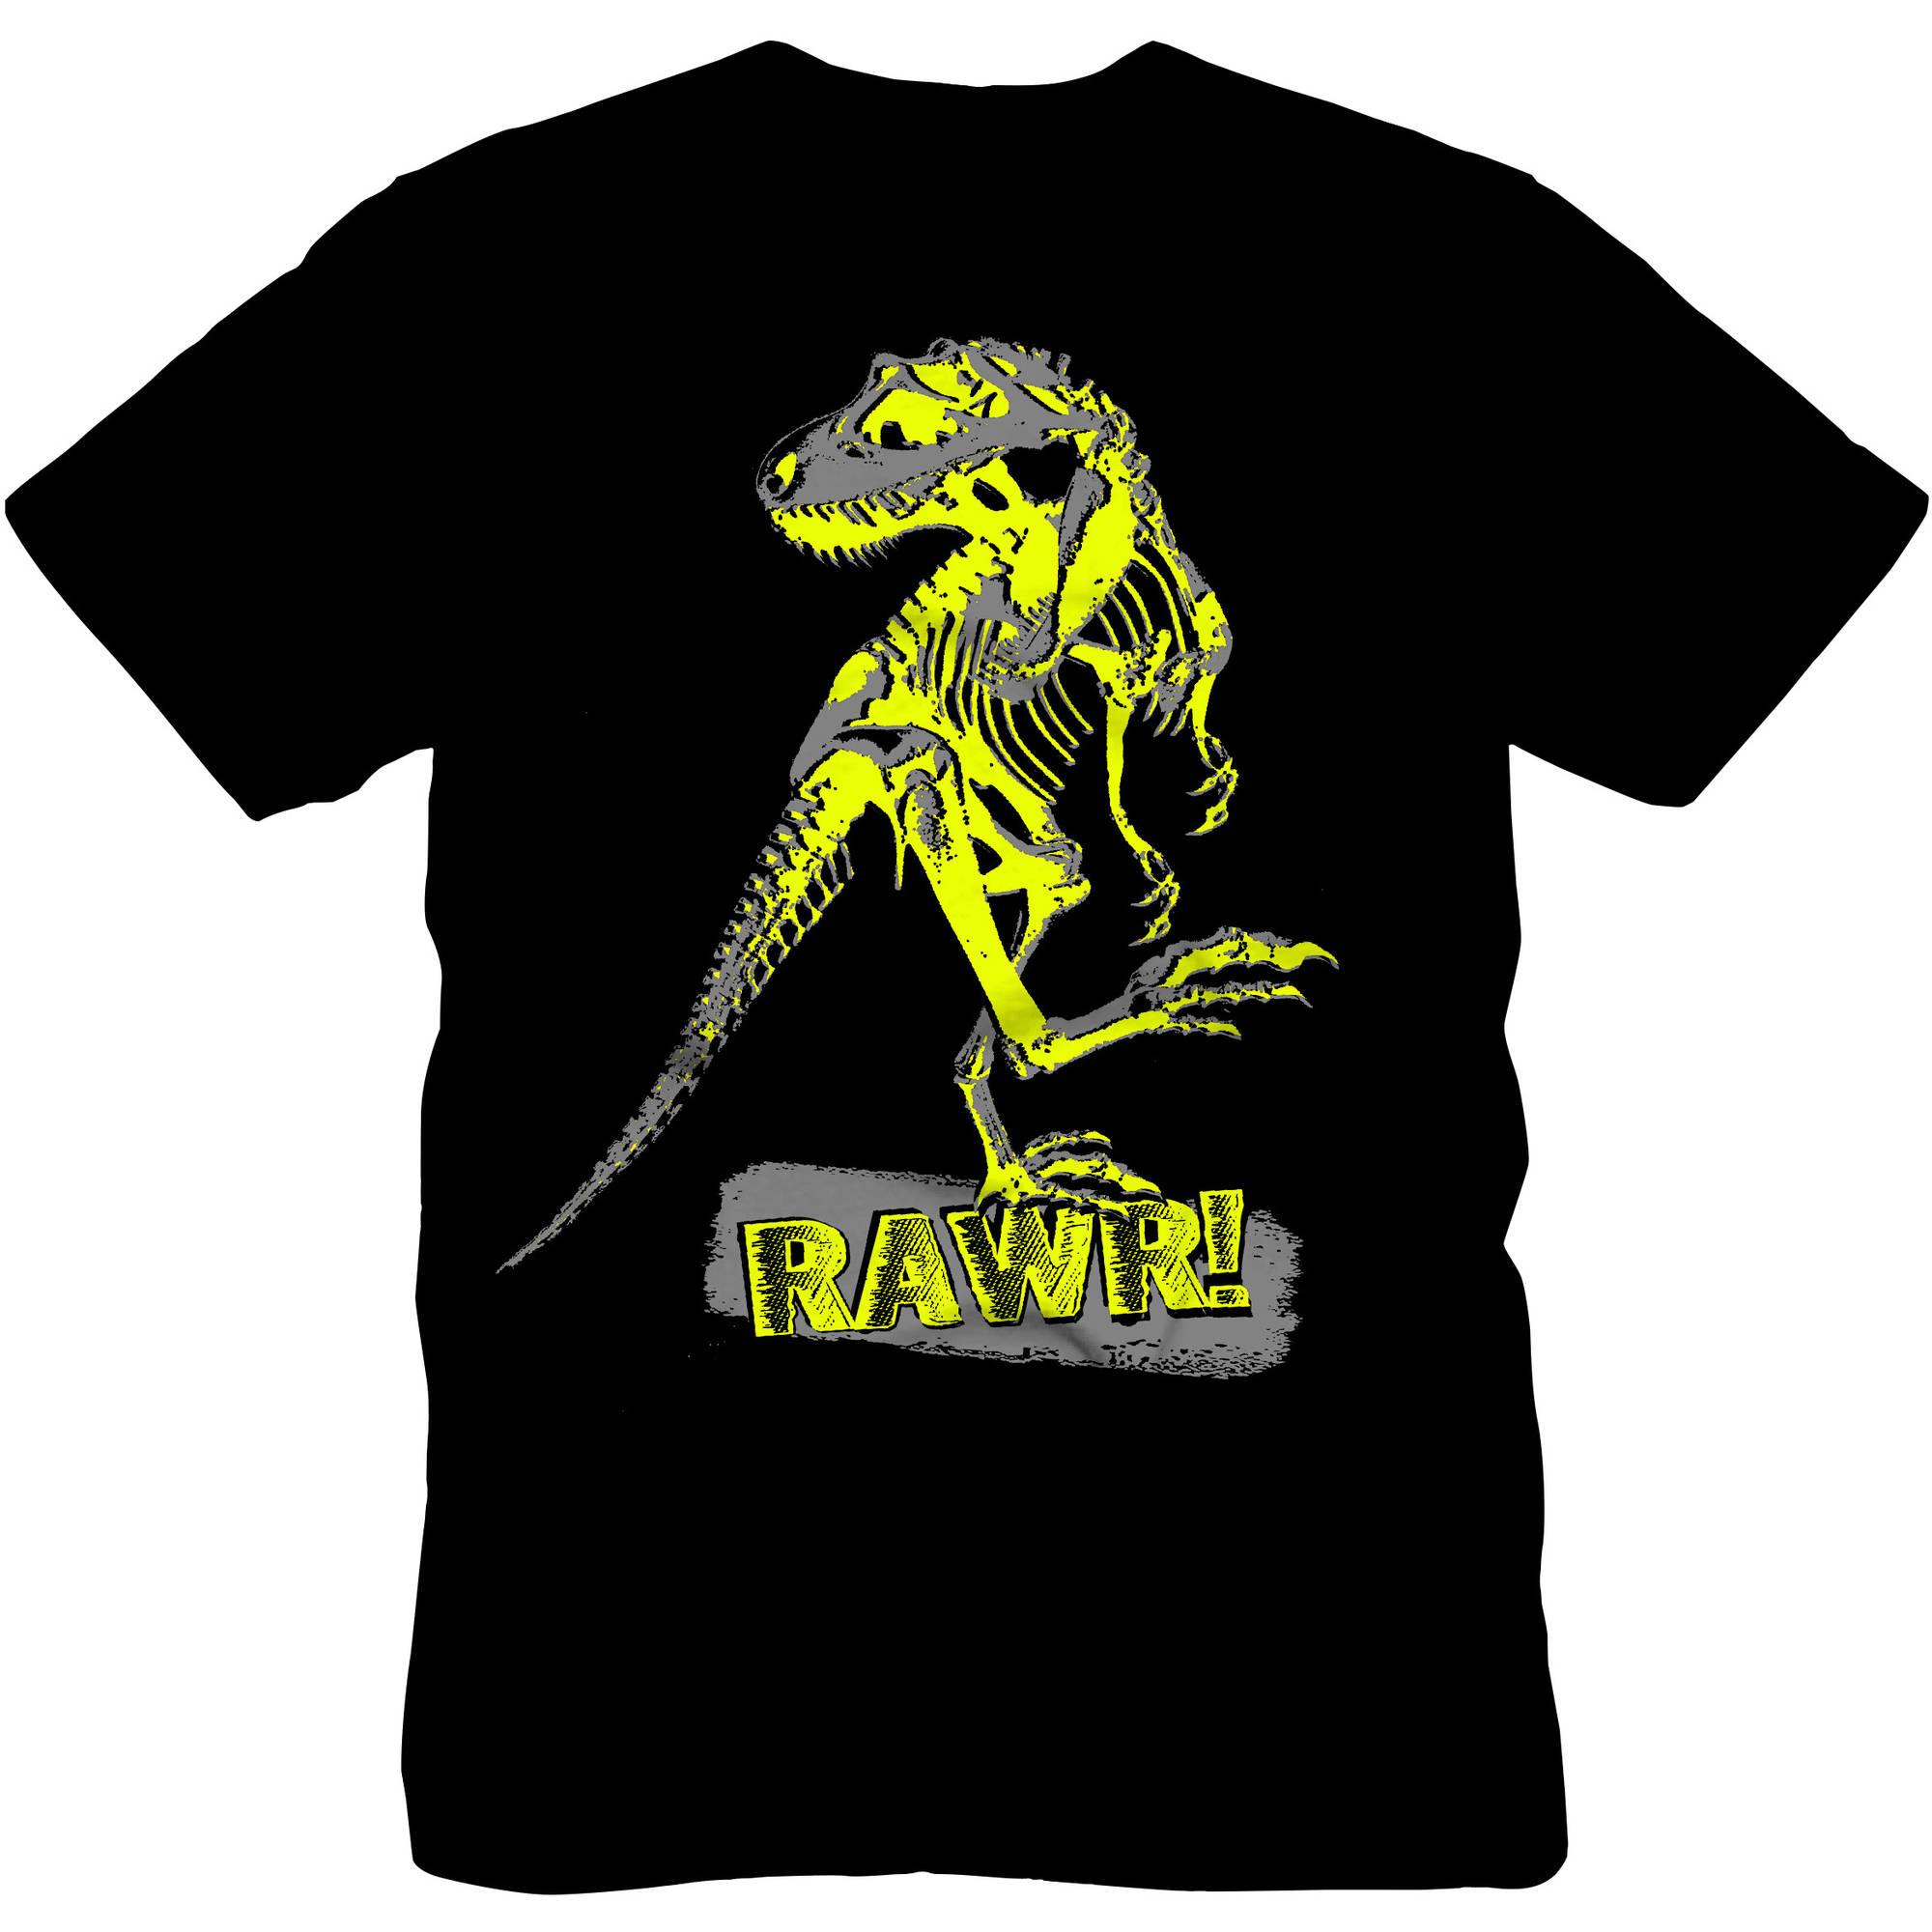 Boys Glow In The Dark Dinosaur Graphic Tee